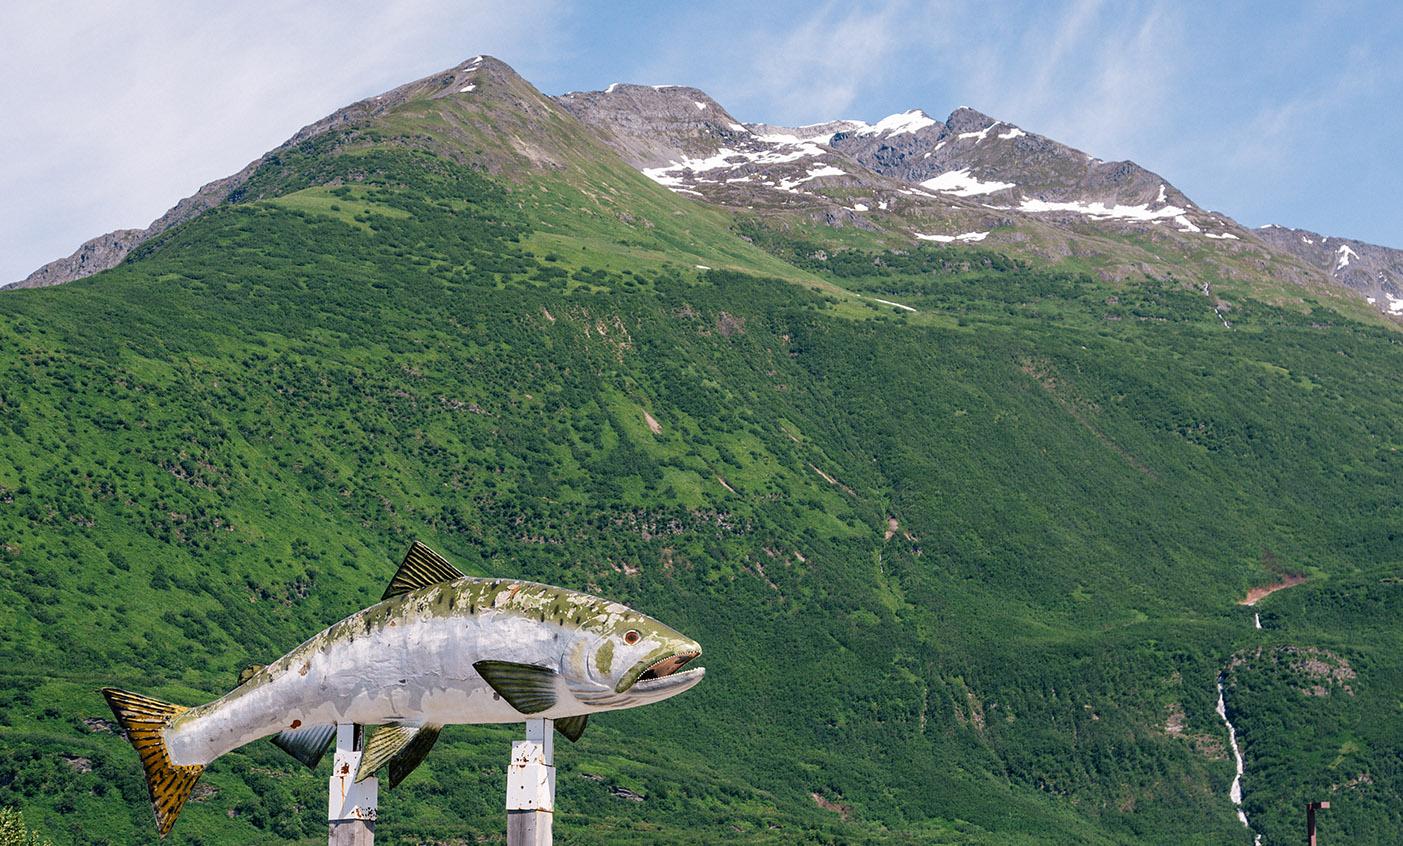 fish1.jpg